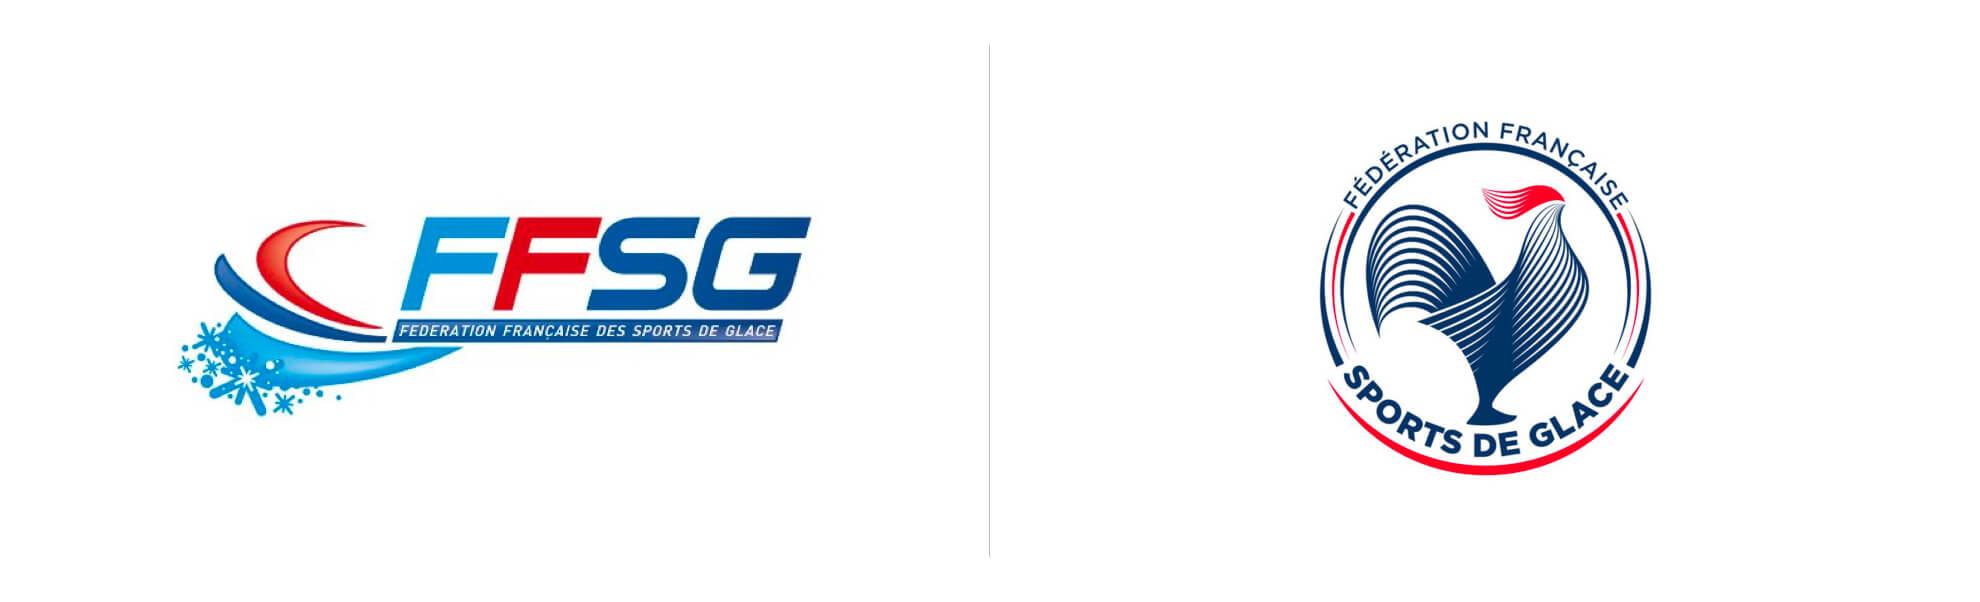 FFSG znowym logo